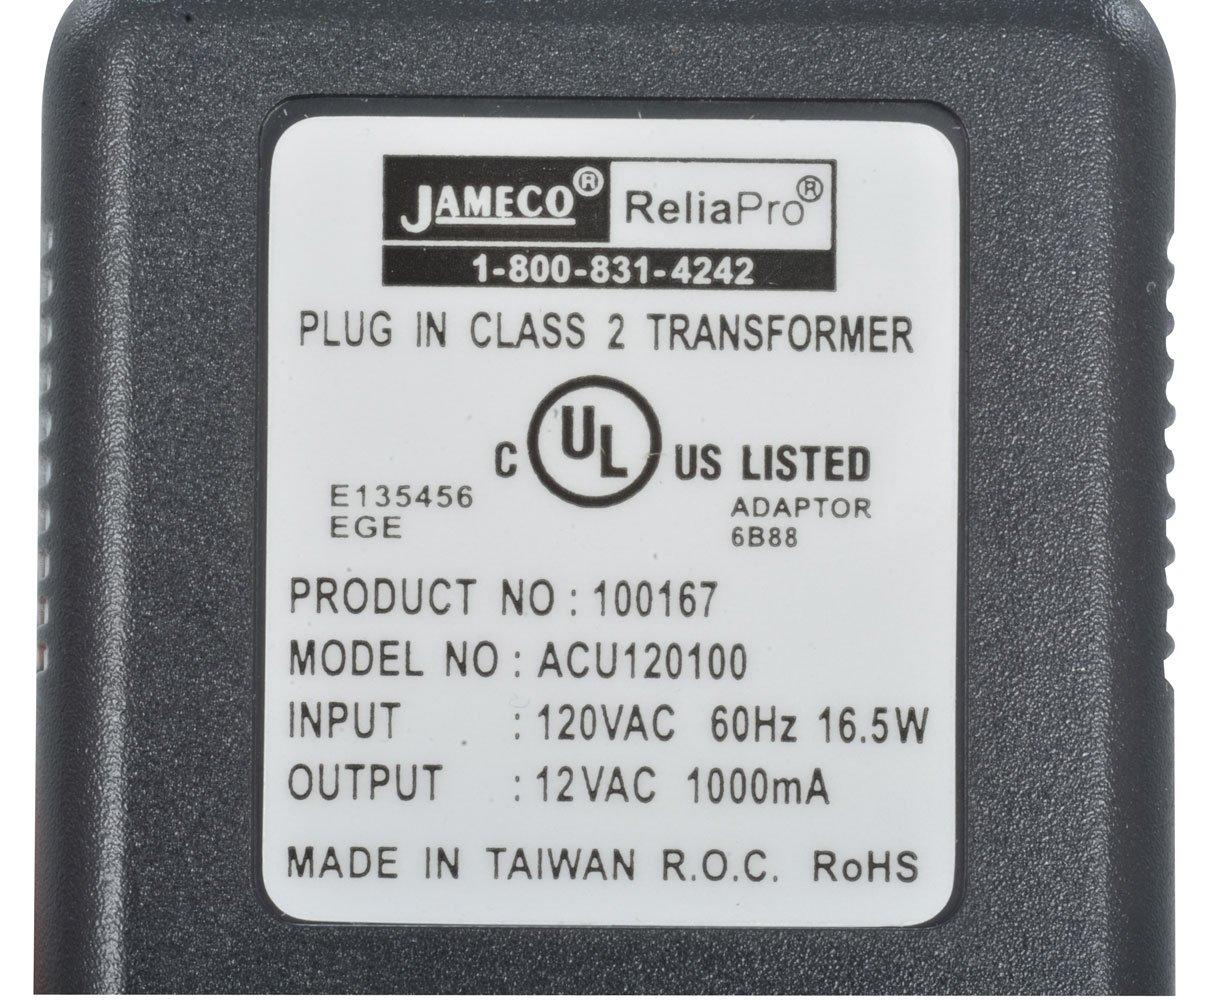 Jameco Reliapro ACU120100D0531 AC to AC Wall Adapter Transformer 12V ...